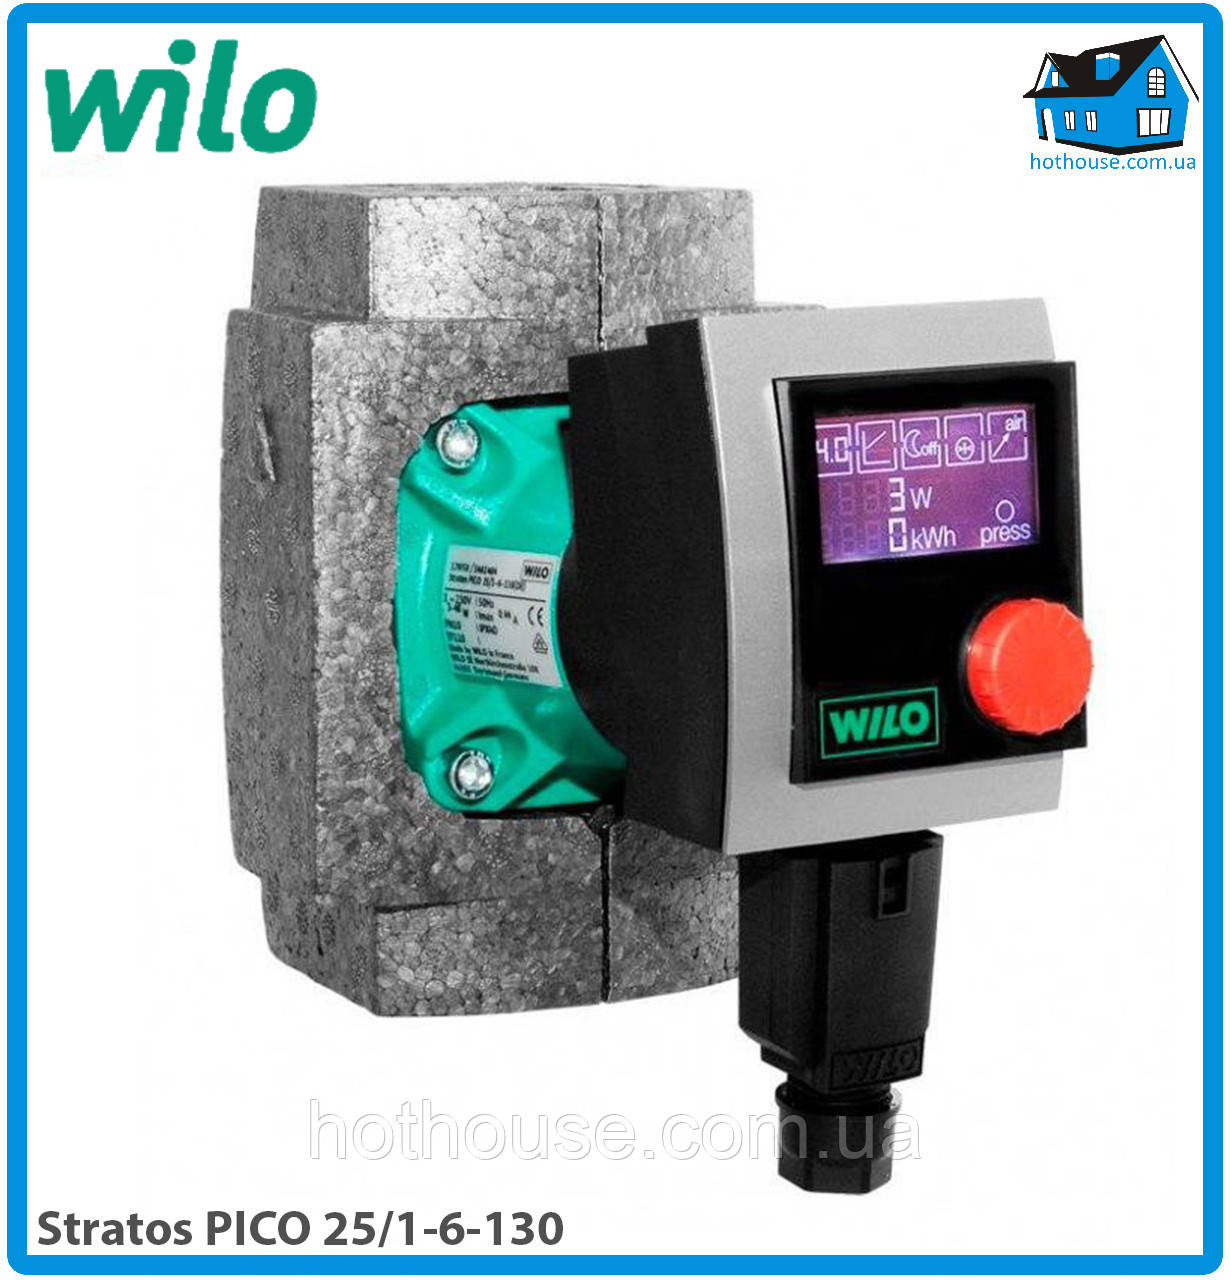 Насос циркуляционный Wilo Stratos PICO 25/1-6-130 (оригинал)